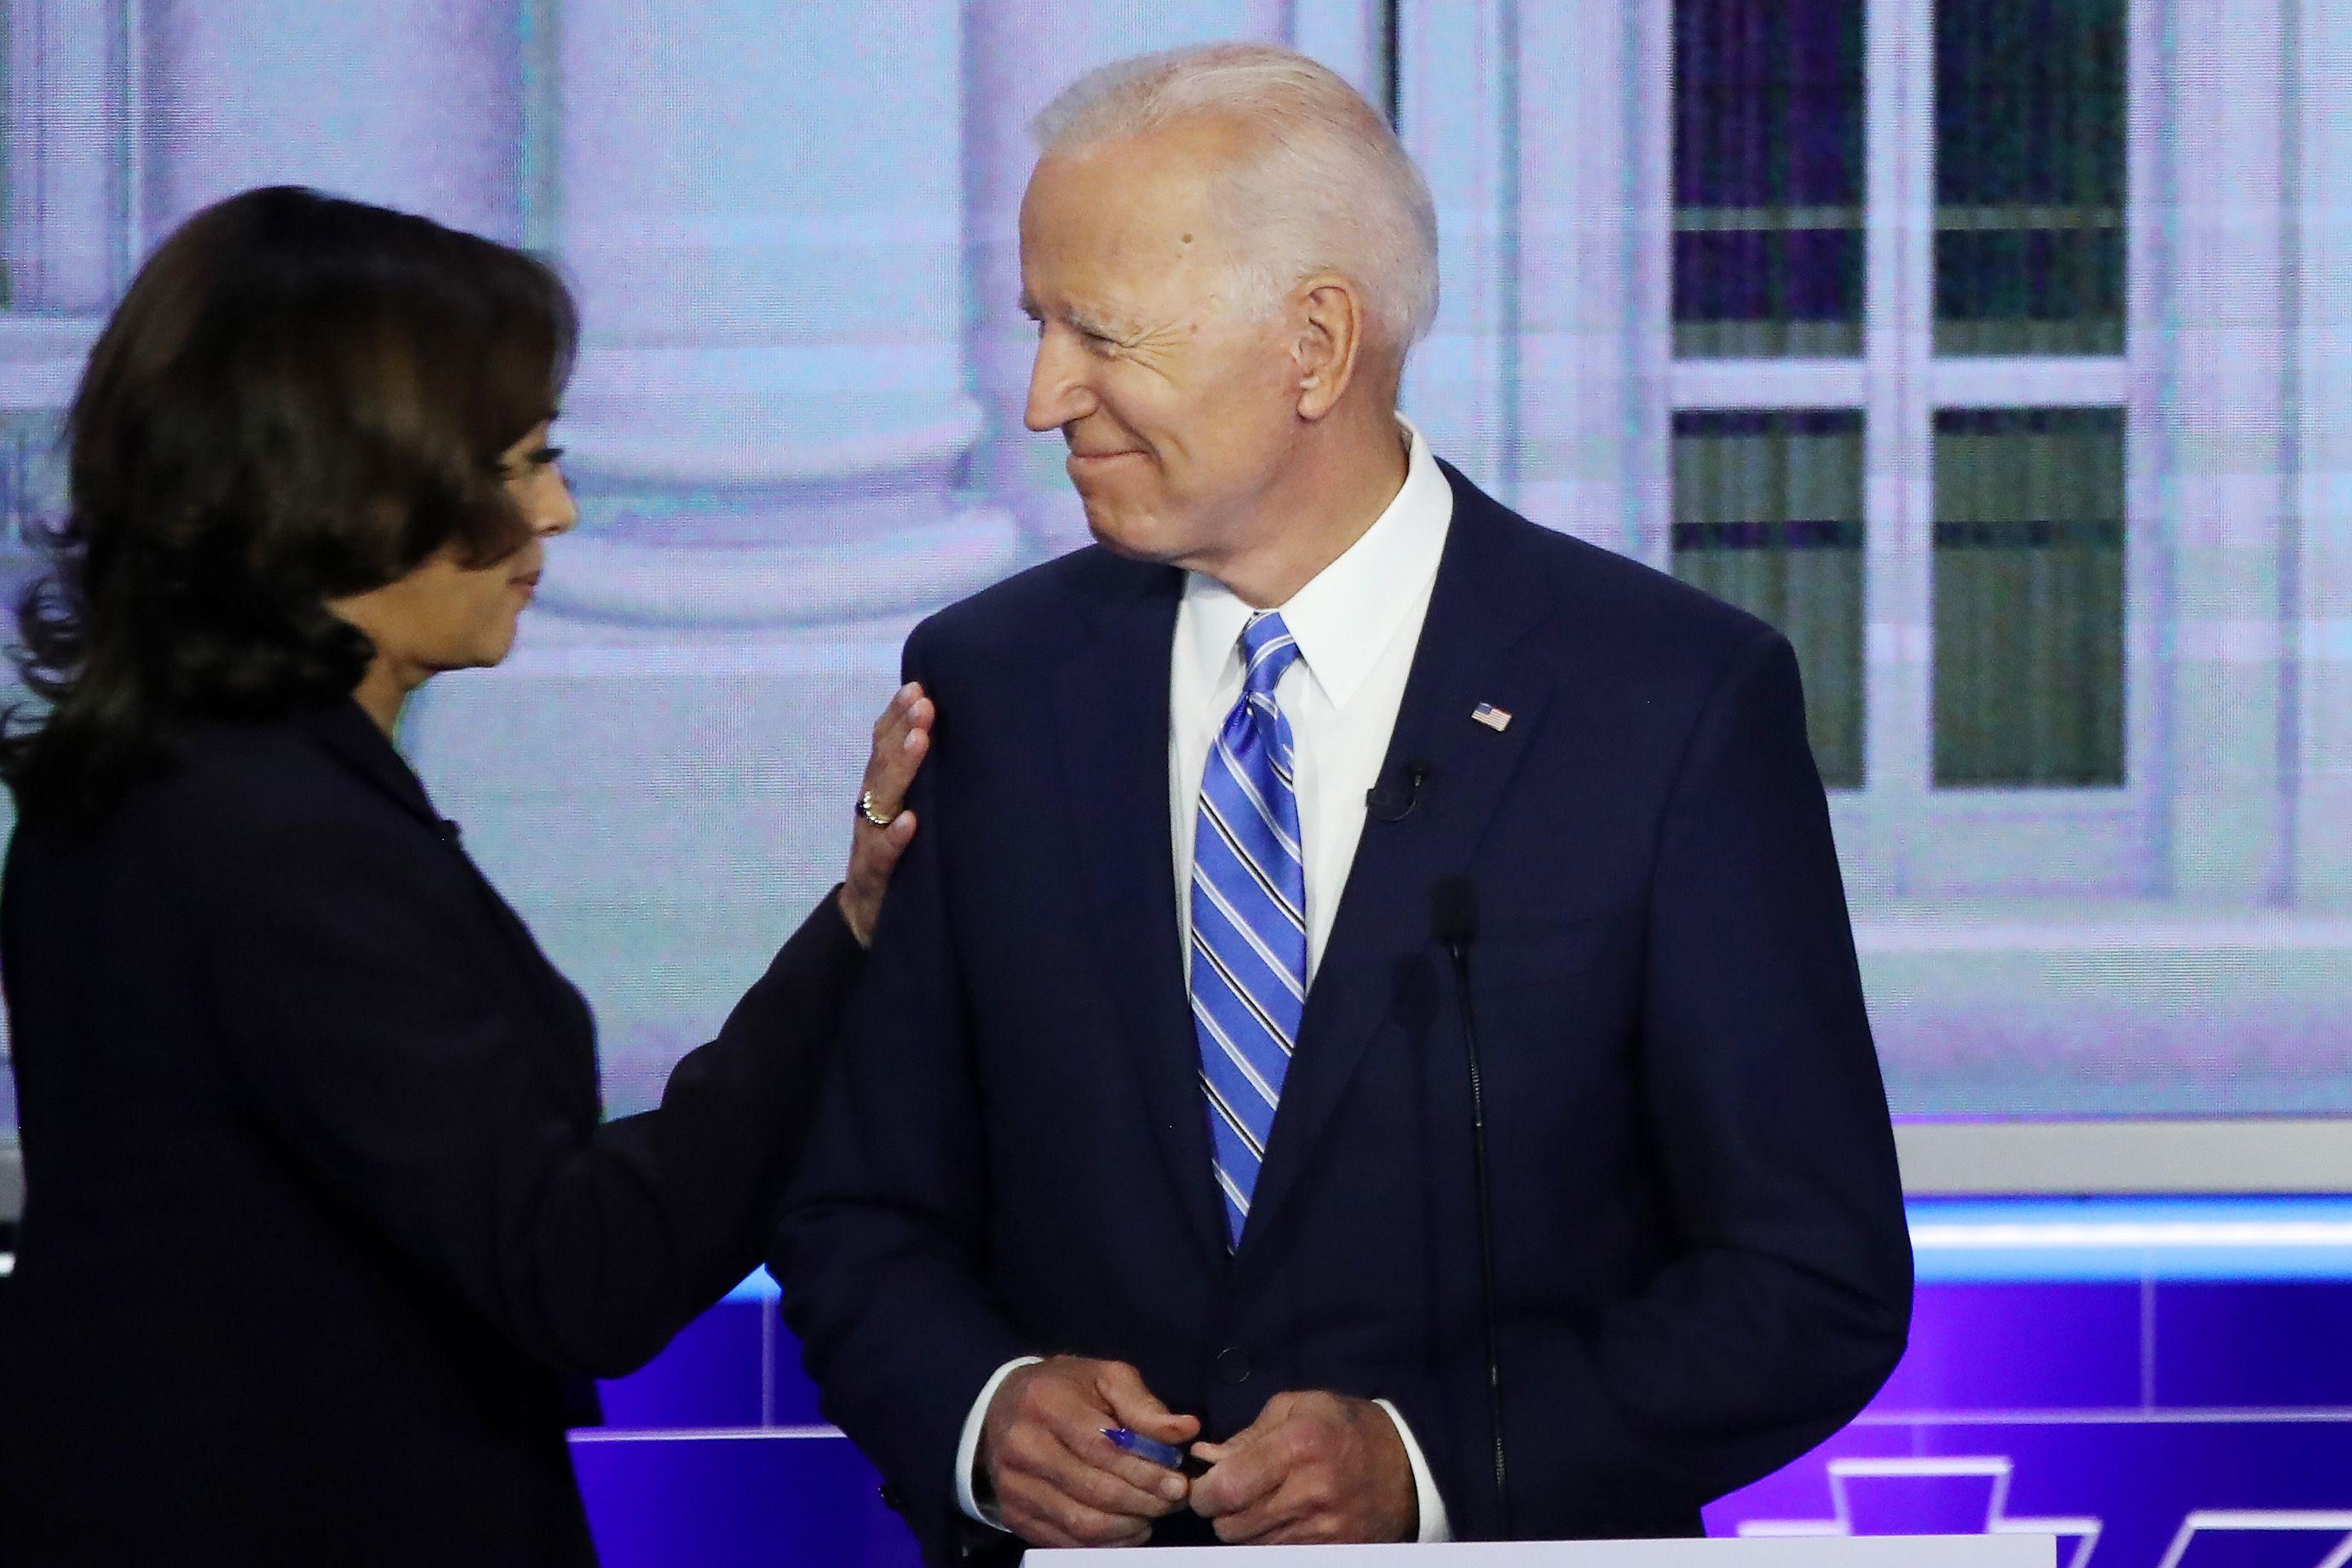 Joe Biden's Clear Road Back From Kamala Harris Debate Debacle